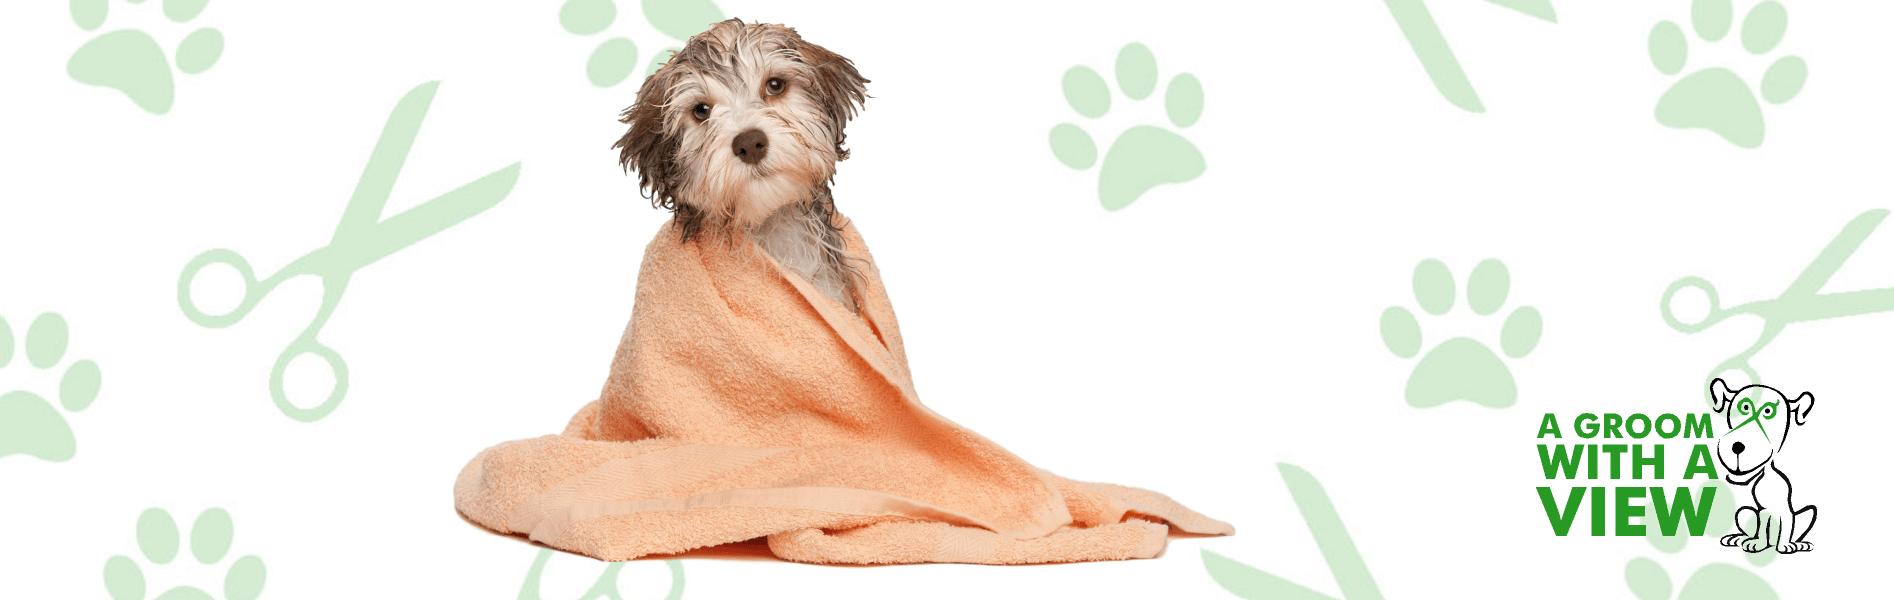 dog grooming lincoln 4